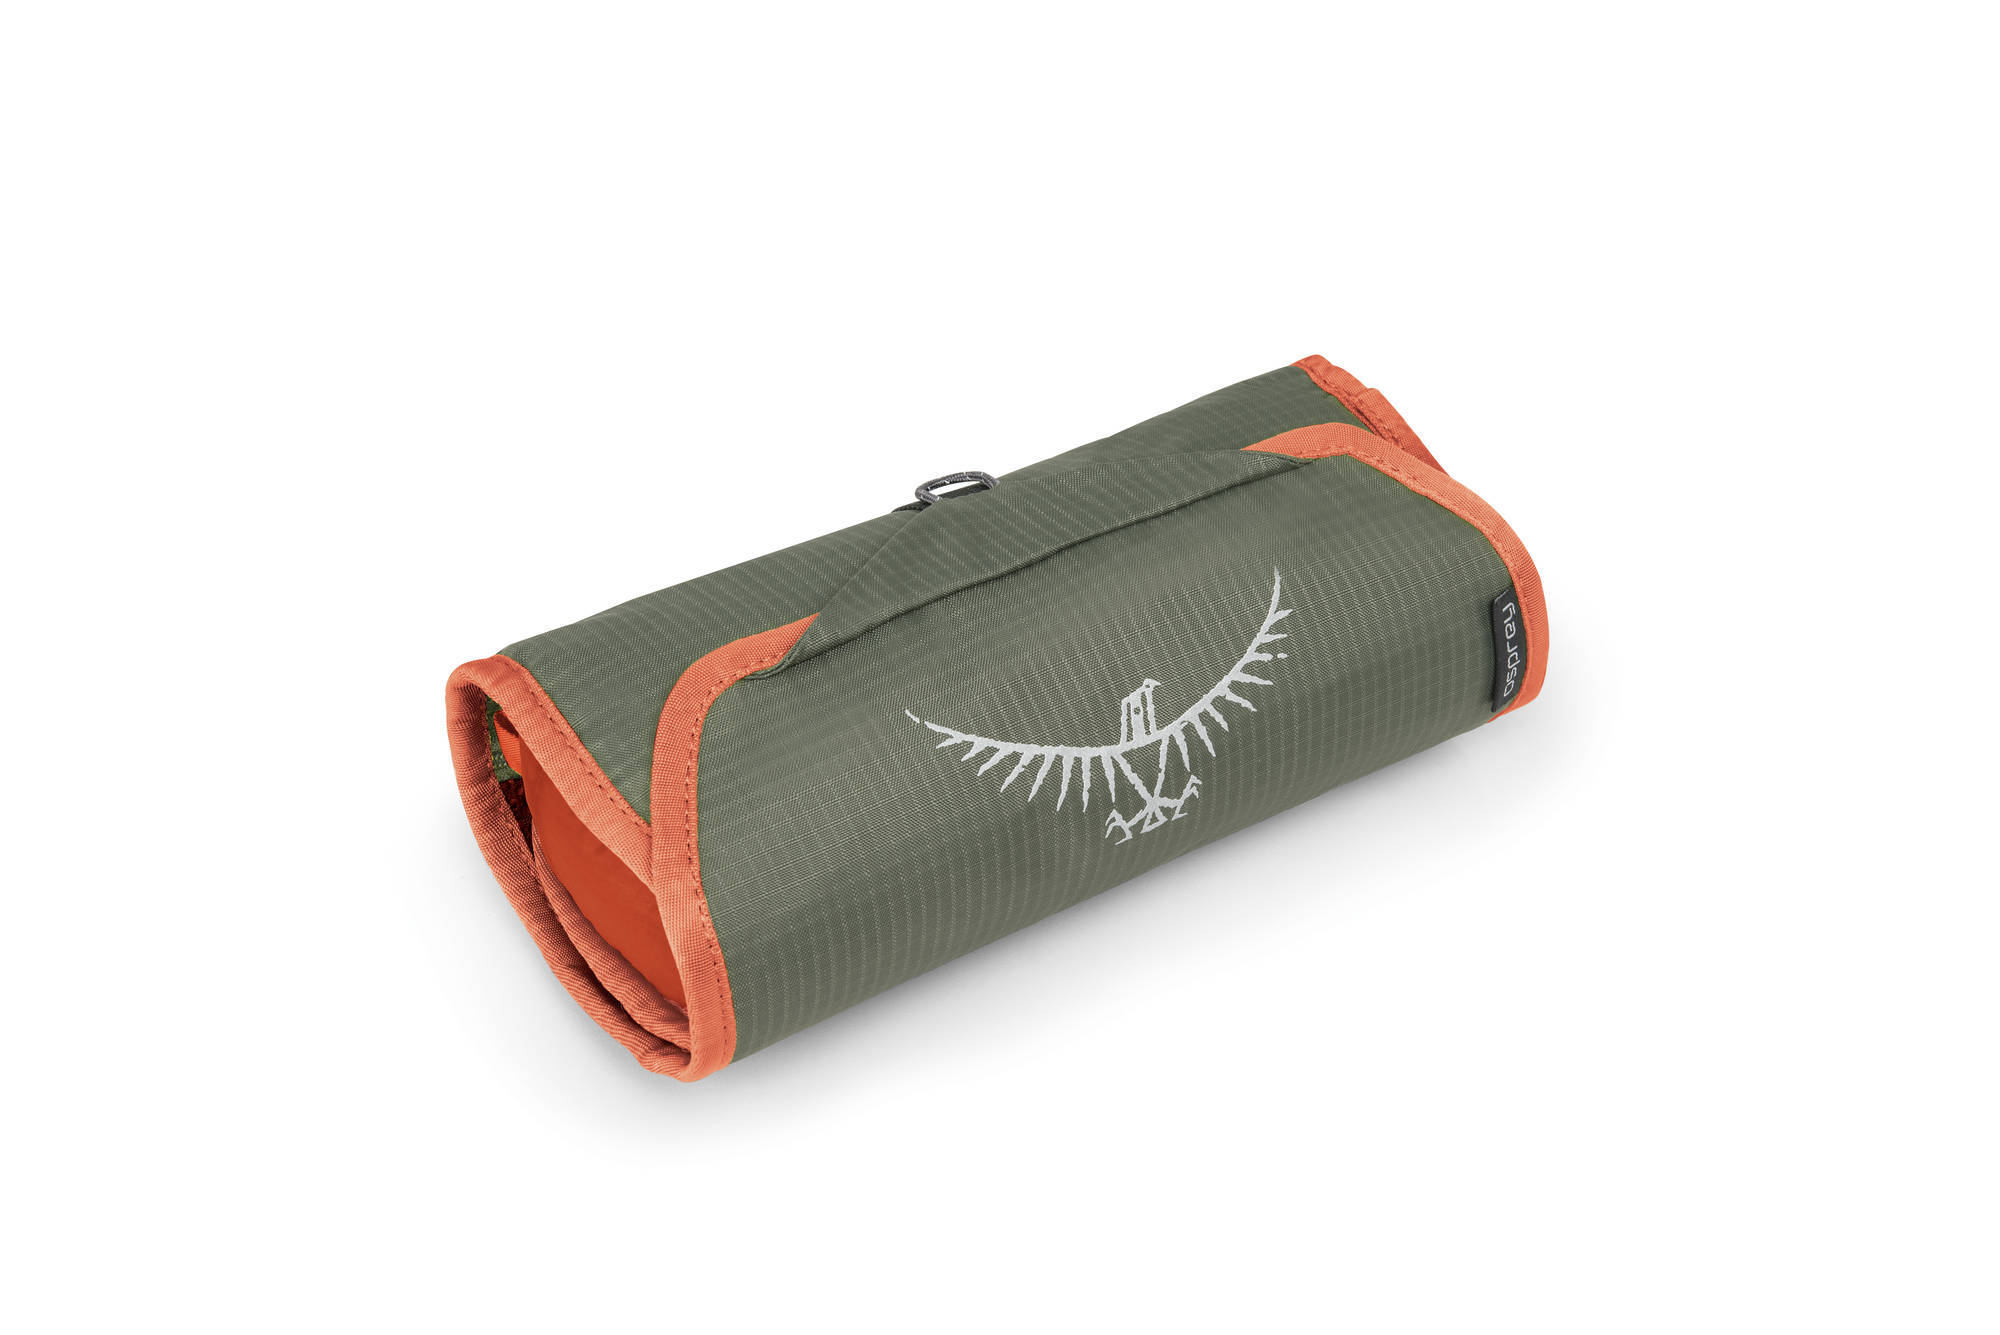 Аксессуары Косметичка дорожная Osprey Ultralight Washbag Roll UL_Washbag_Roll_Side_Poppy_Orange_web.jpg